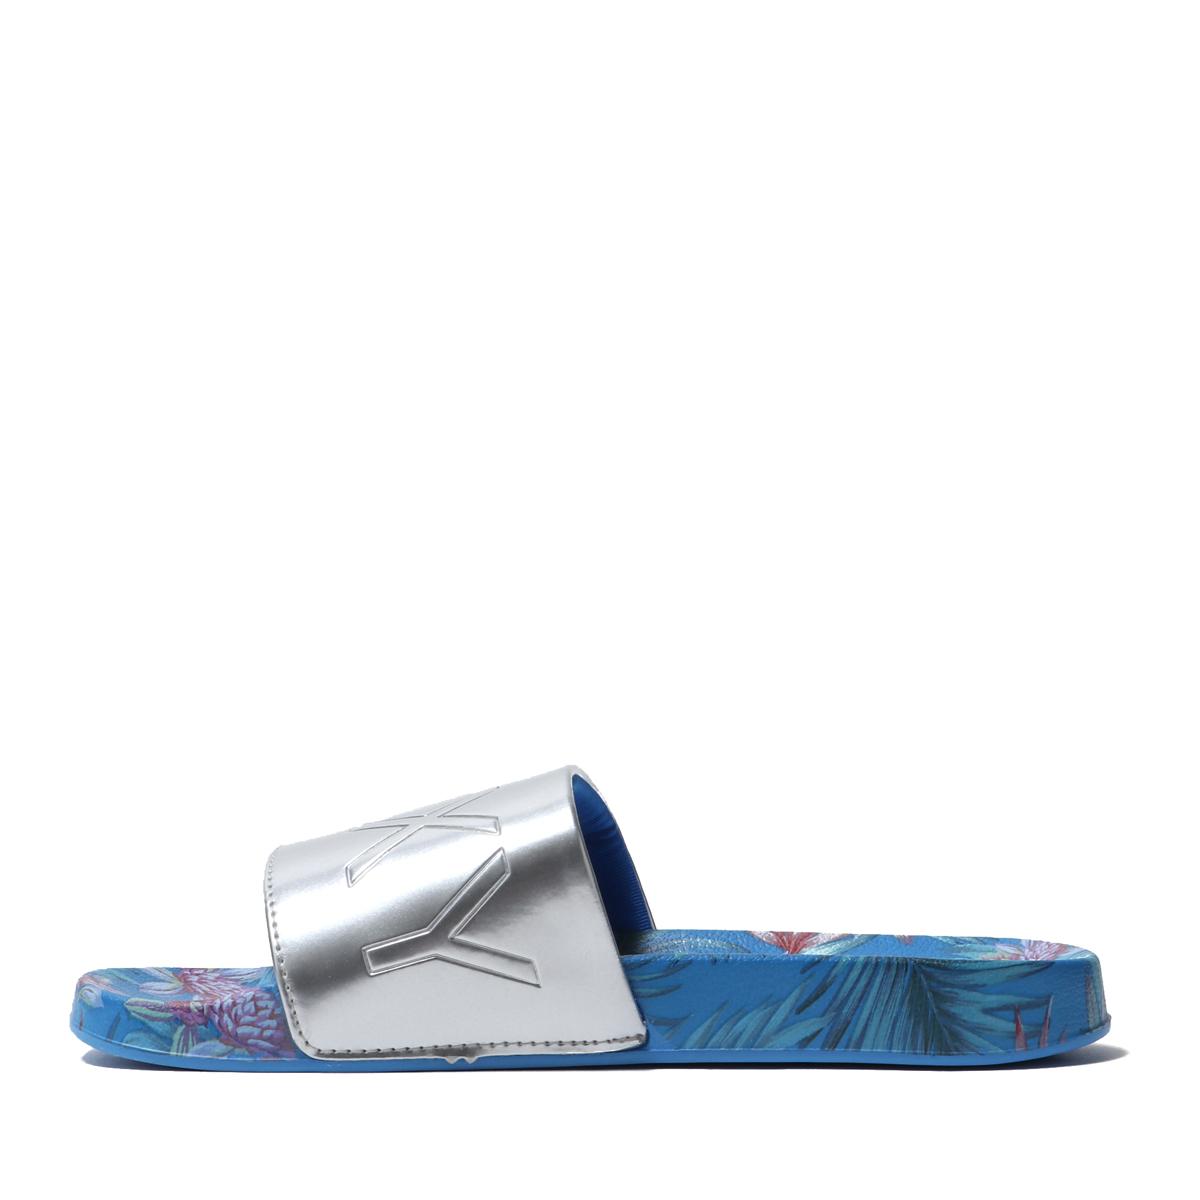 ROXY SLIPPY PRINTED(BLUE)(ロキシー スリッピー プリンテッド)【レディース】【サンダル】【19SS-I】